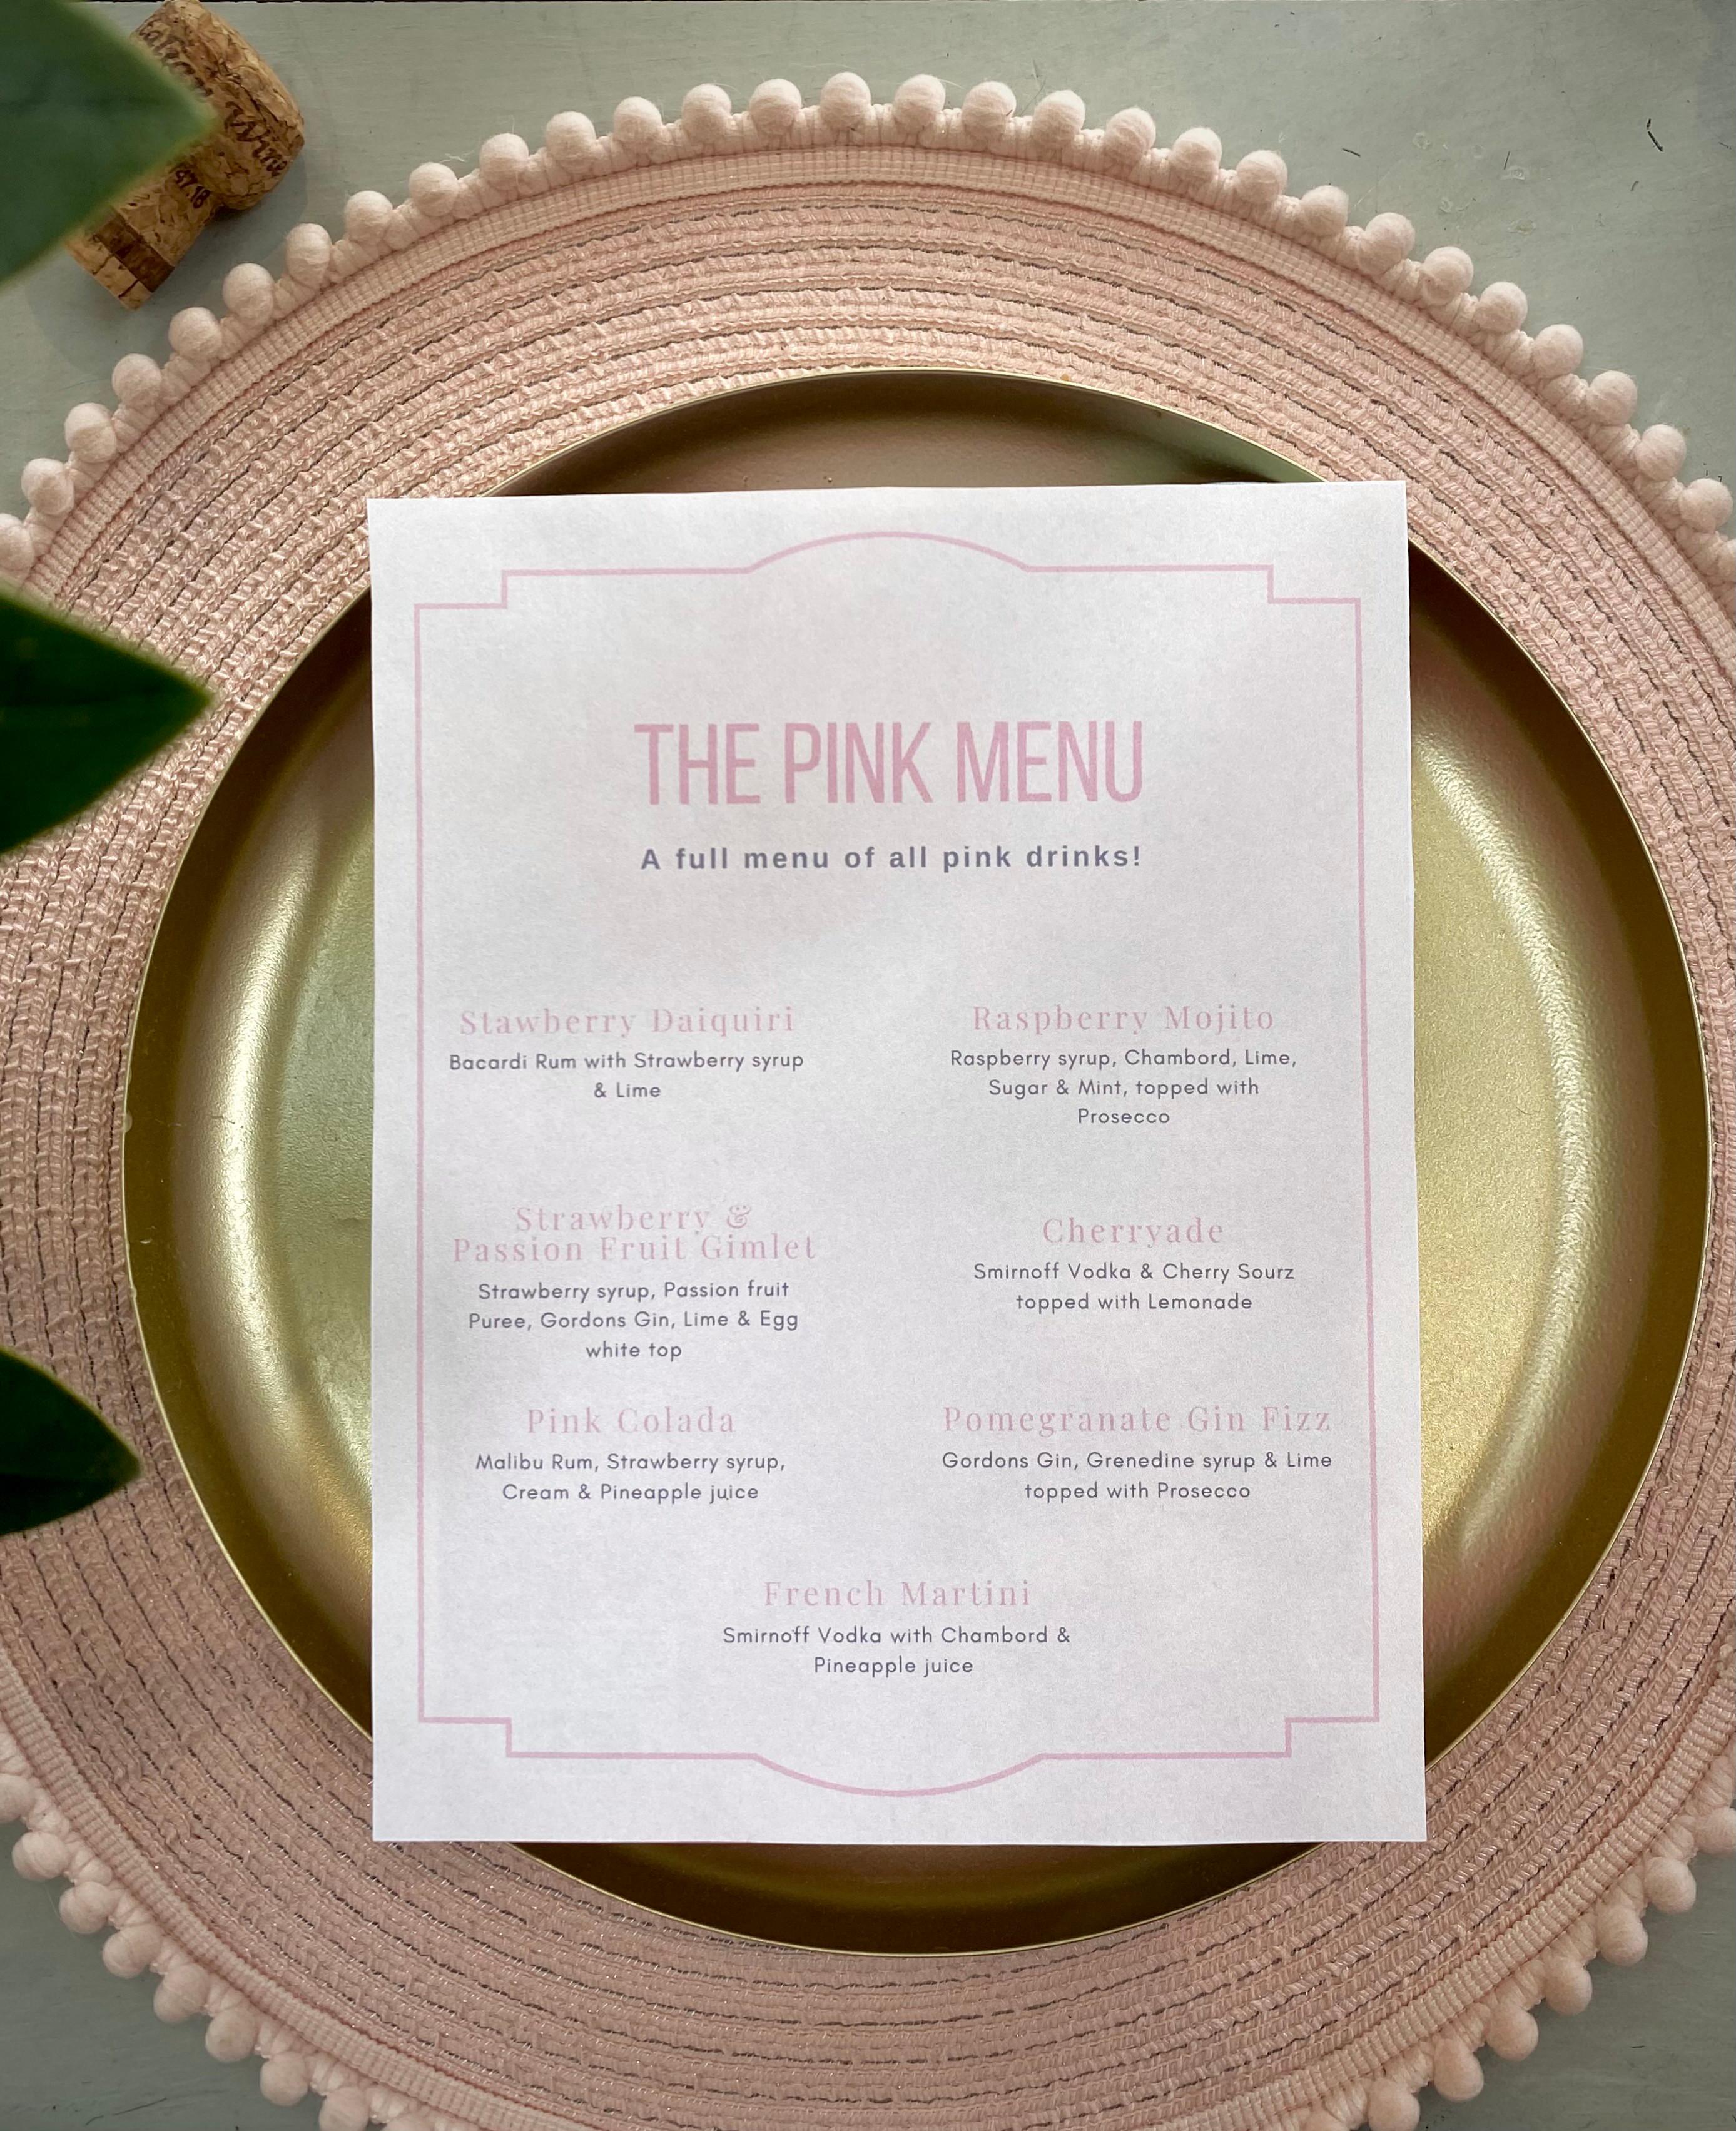 The Pink Menu